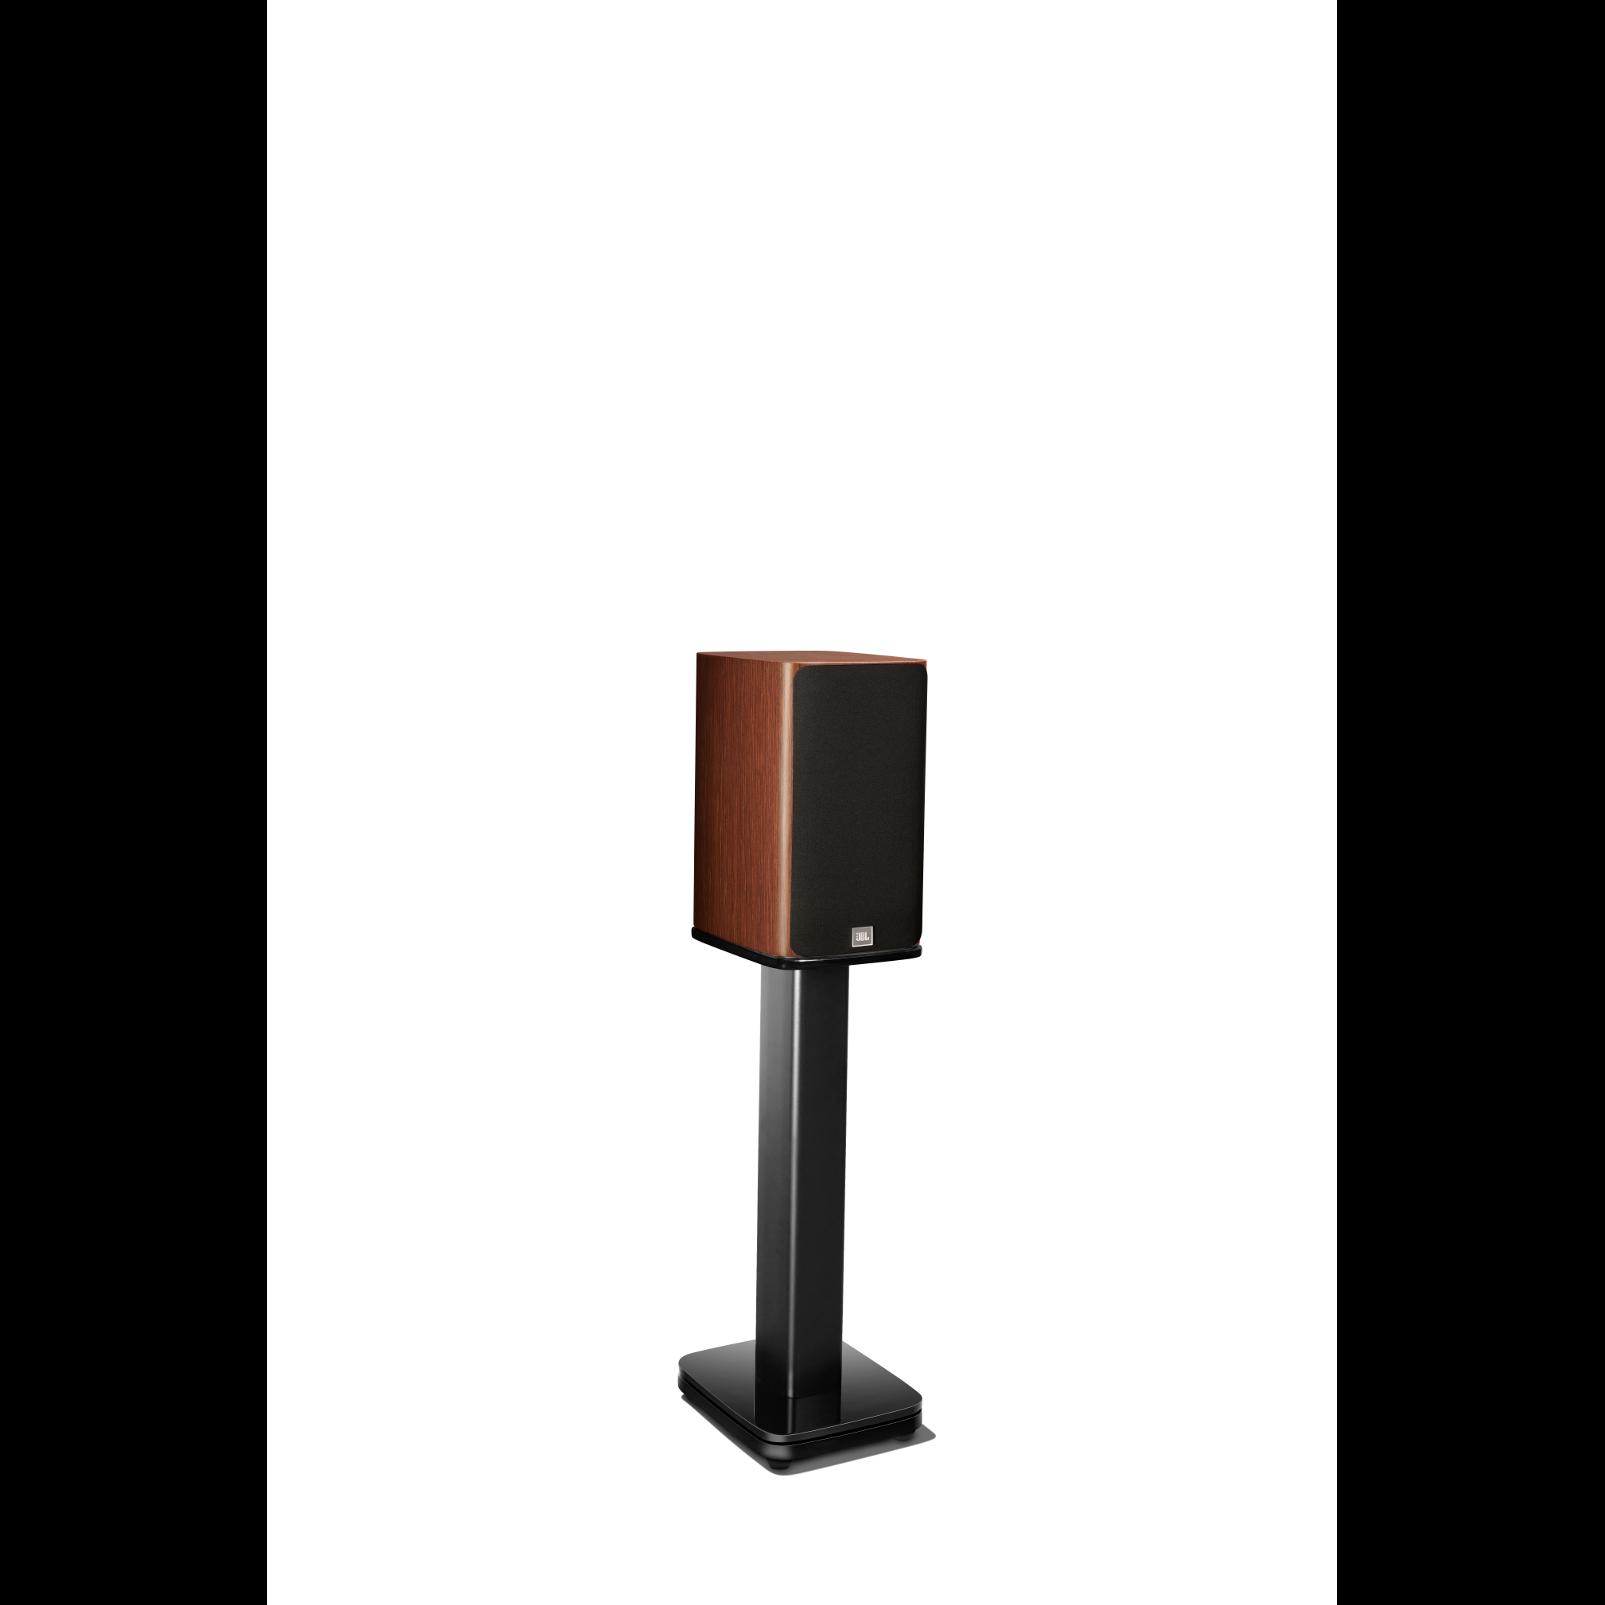 HDI-1600 - Walnut - 2-way 6.5-inch (165mm) Bookshelf Loudspeaker - Detailshot 4